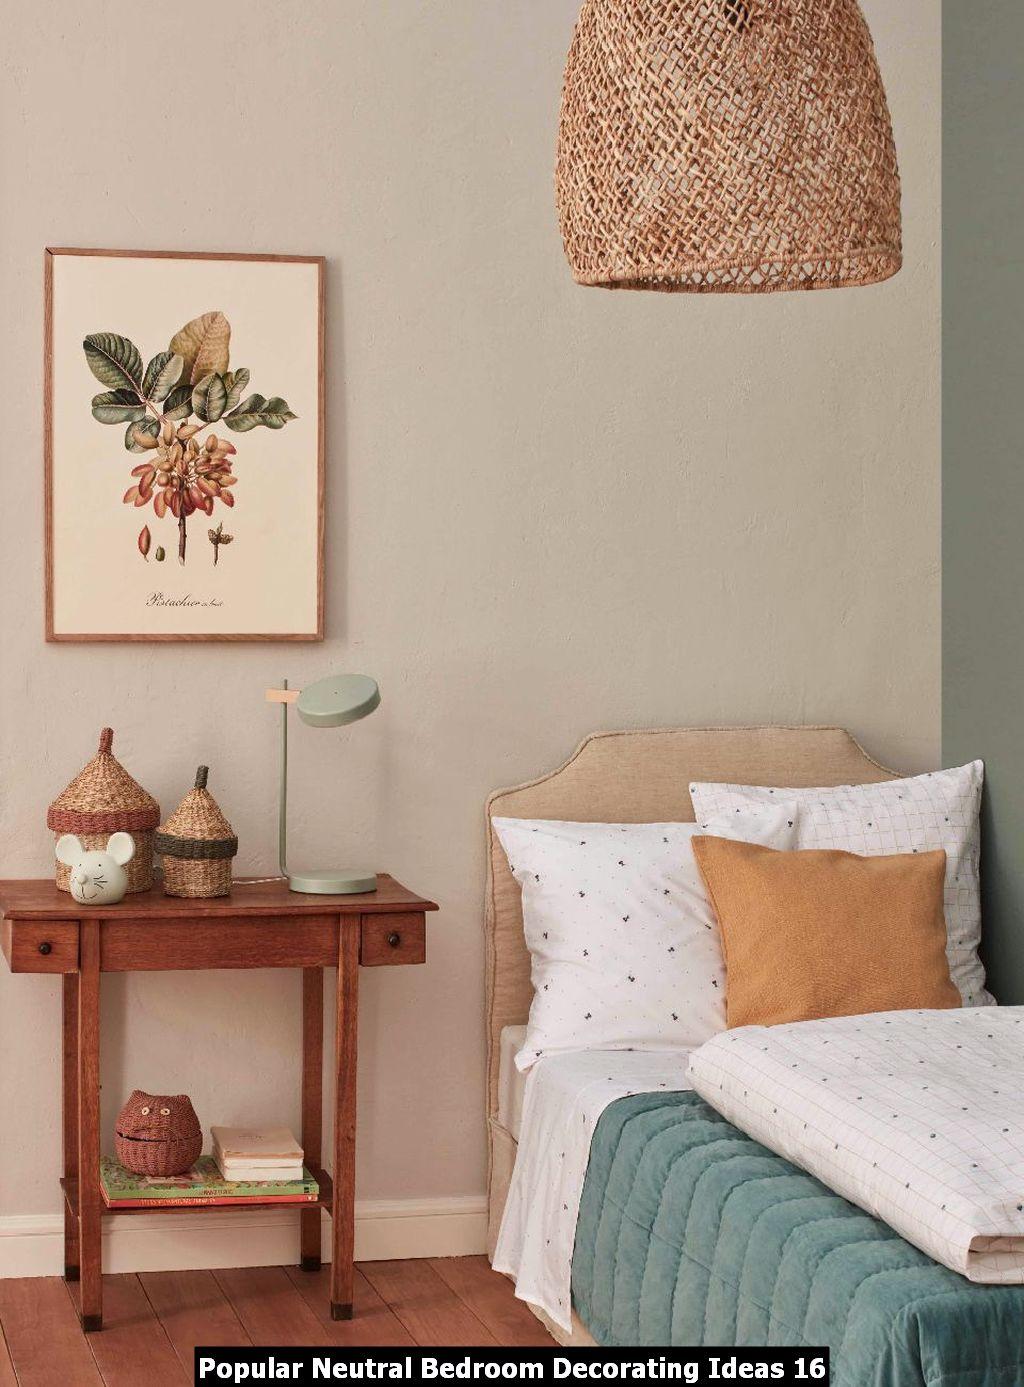 Popular Neutral Bedroom Decorating Ideas 16 Homyhomee